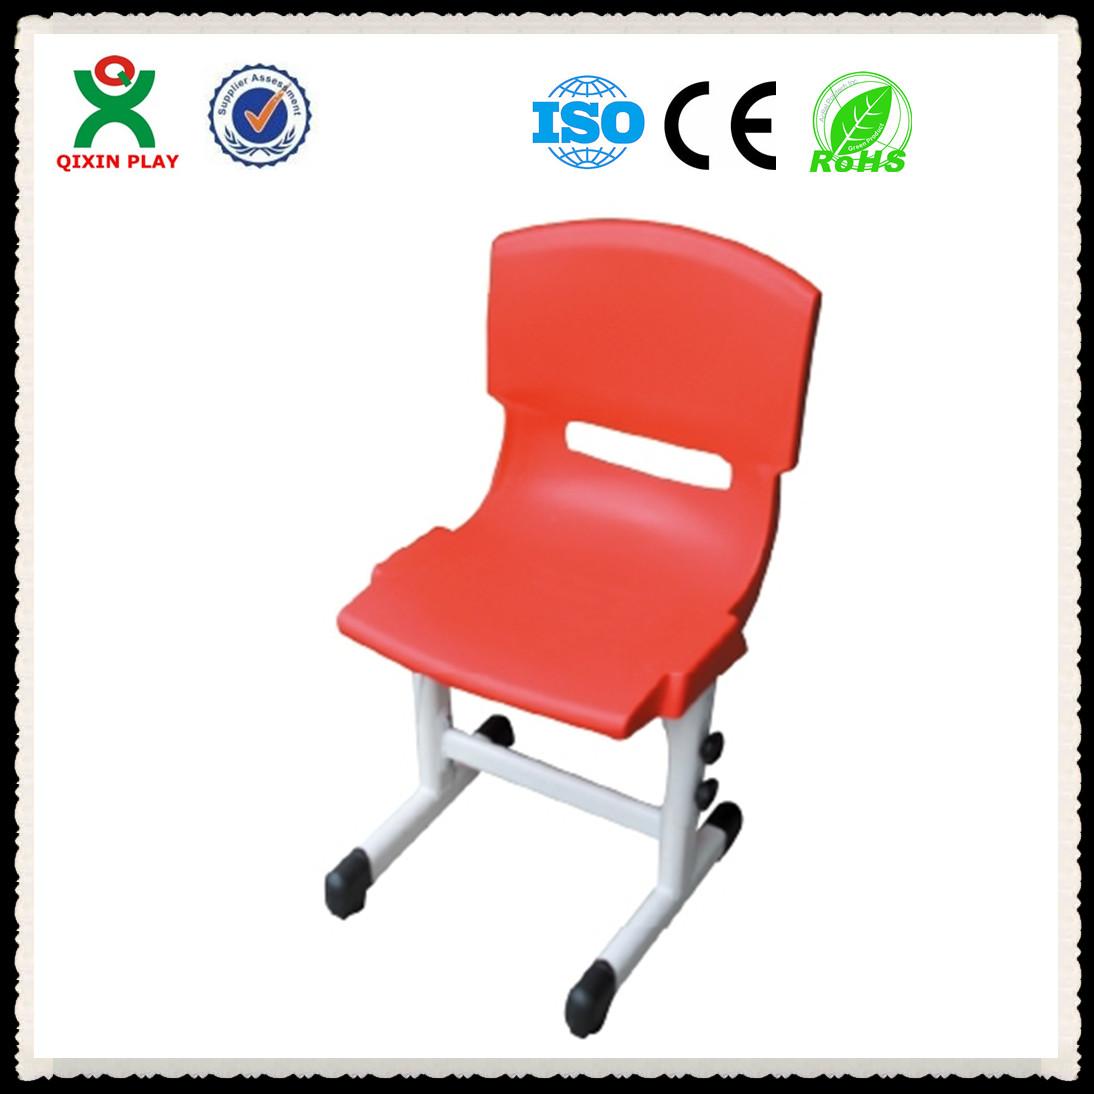 Luxury Adjustable Preschool Acrylic Dining Chairs/school Furniture ...